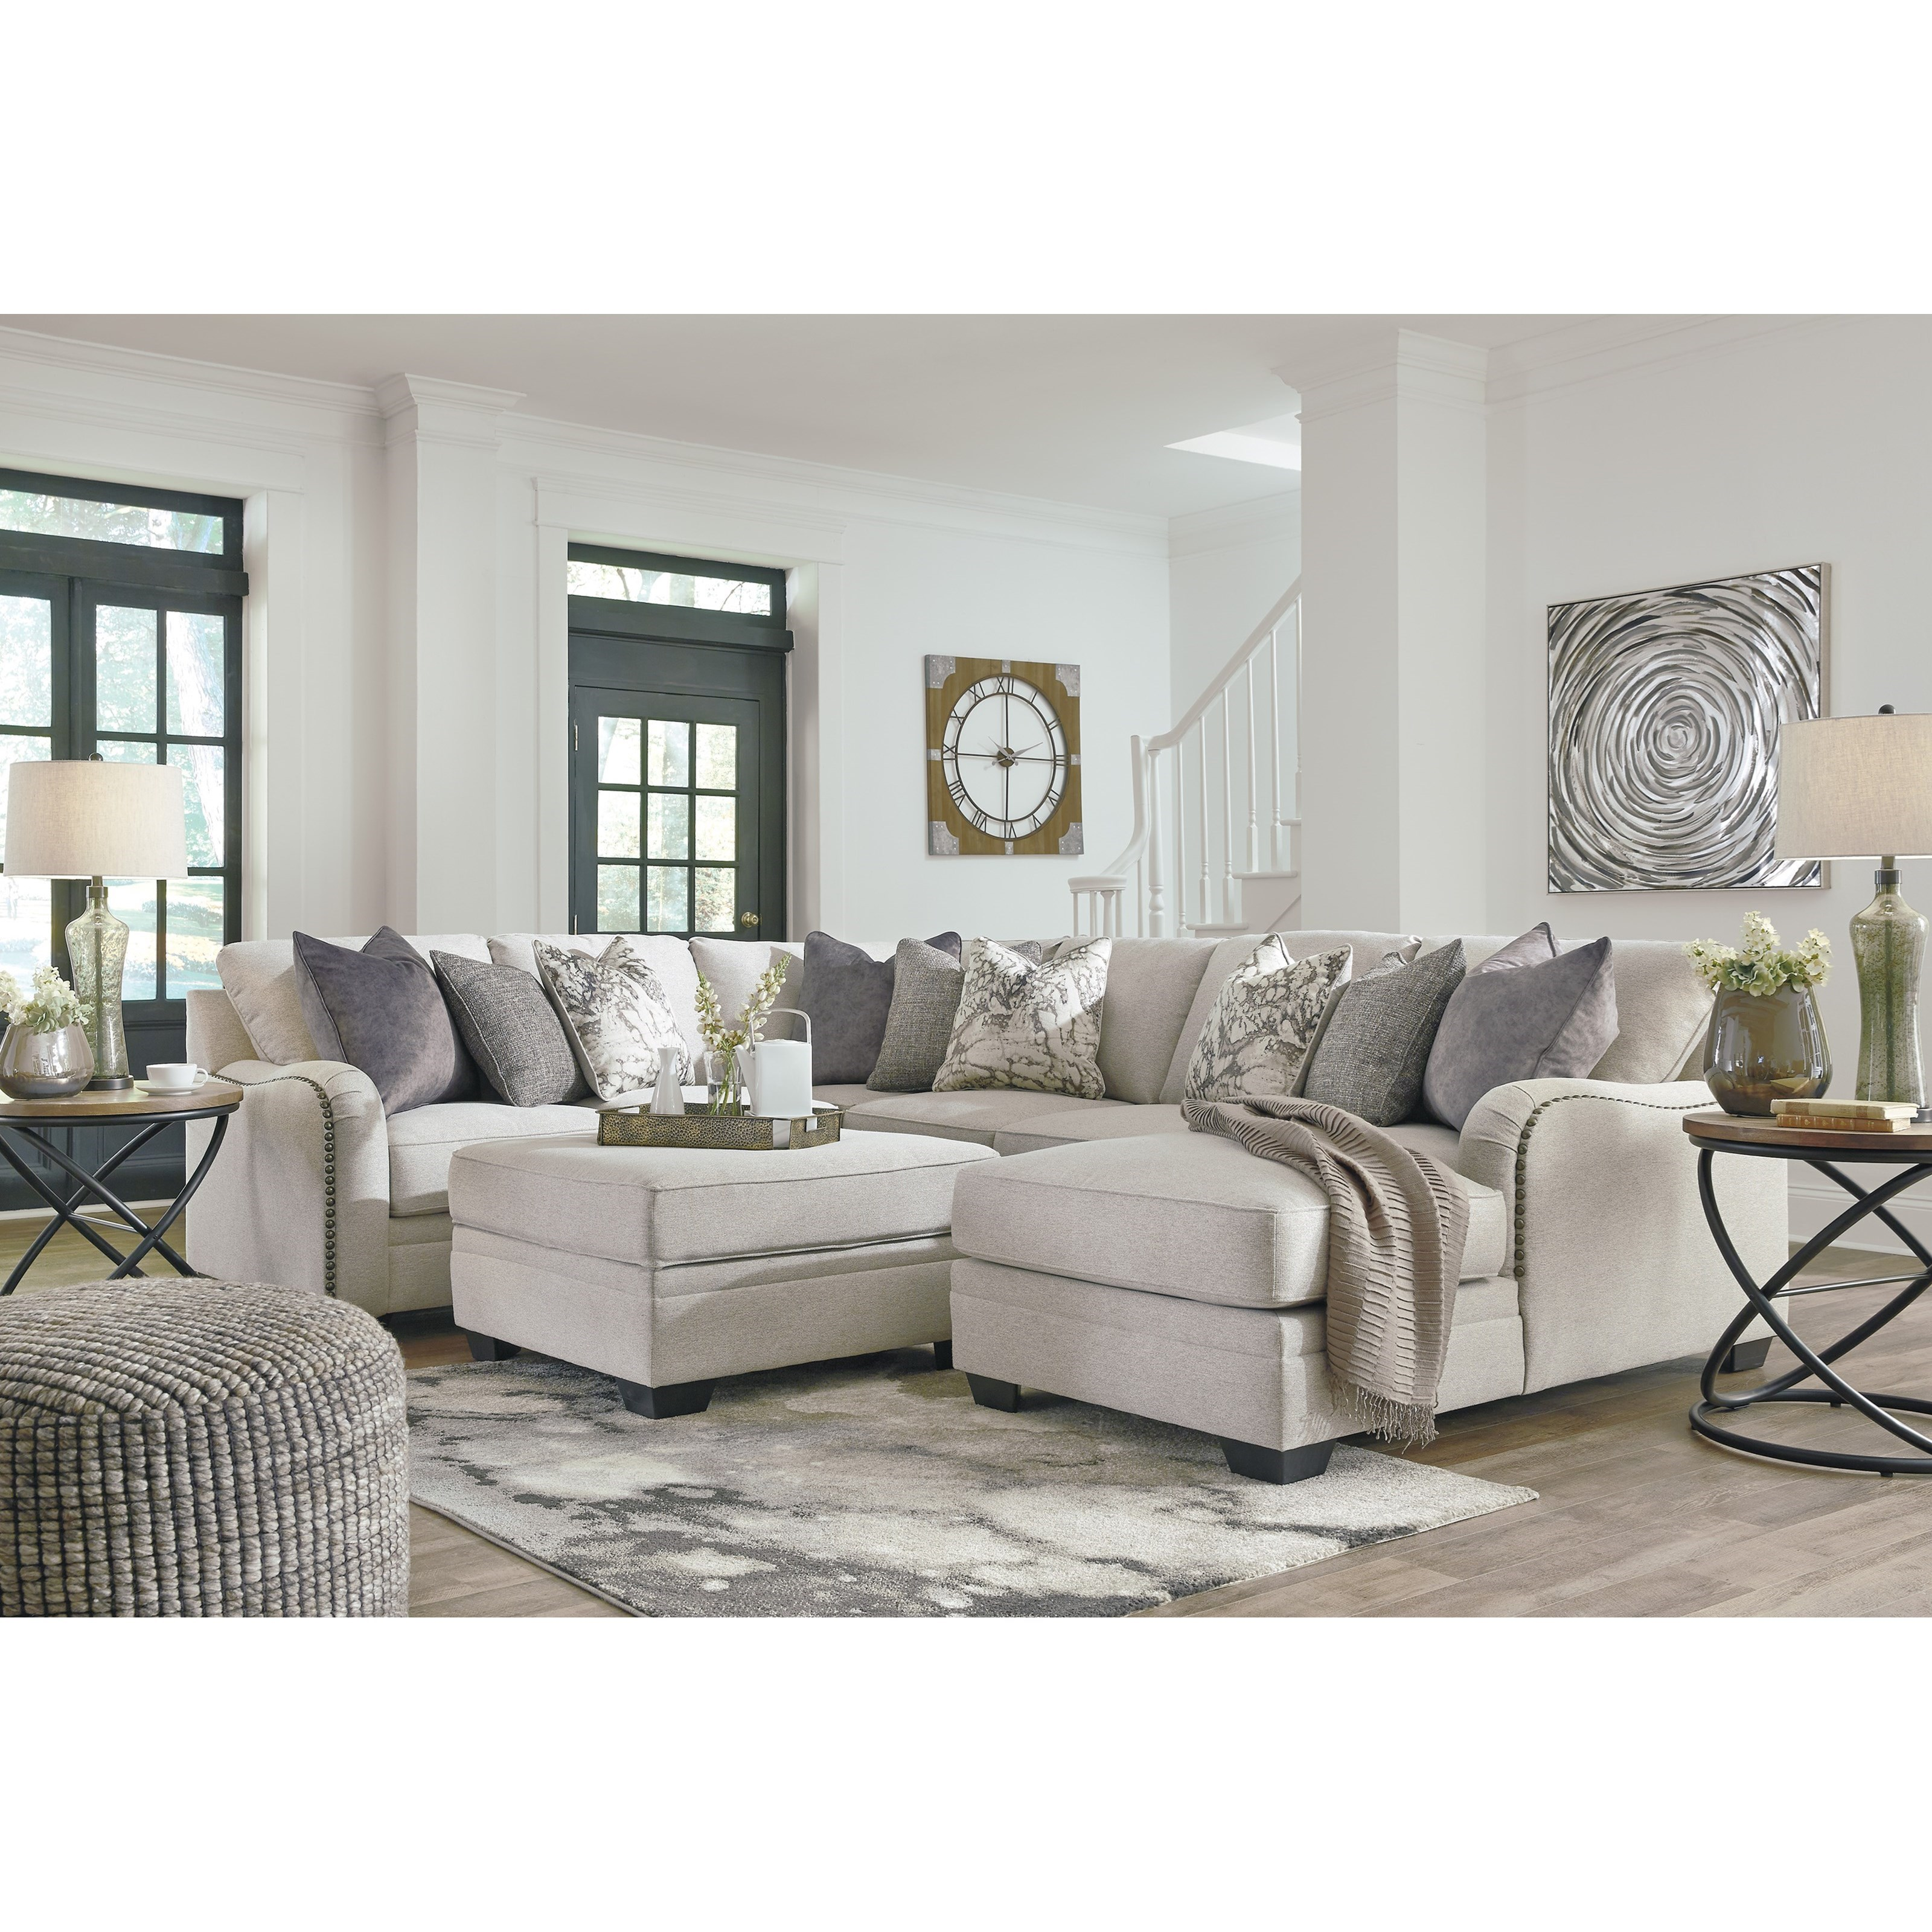 Dellara Stationary Living Room Group by Benchcraft at Johnny Janosik